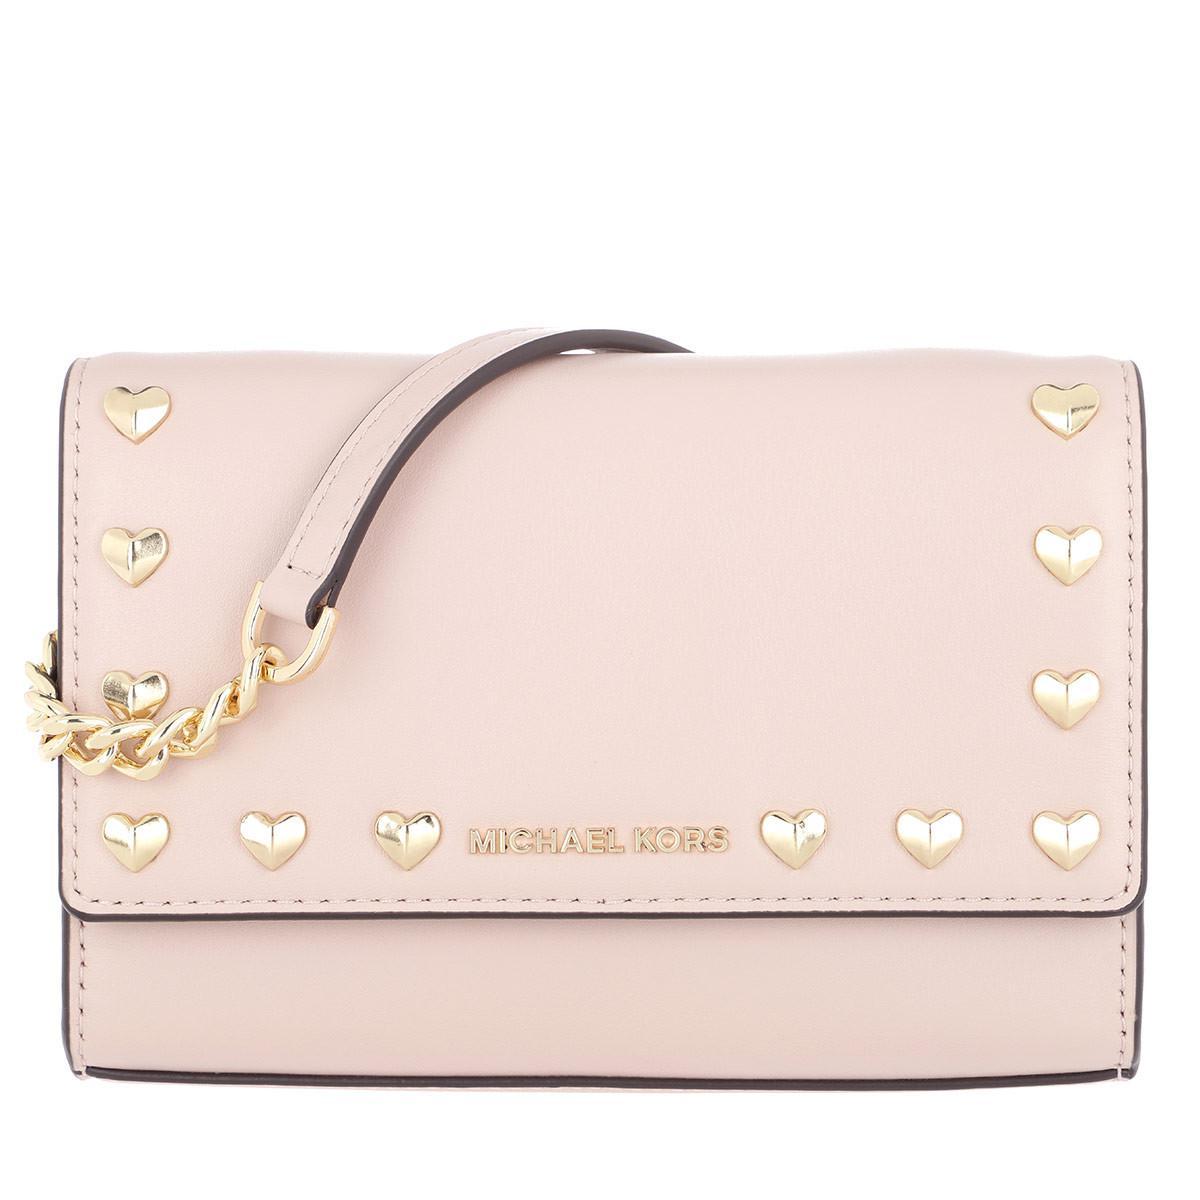 Michael Kors Ruby Medium Clutch Soft Pink in Pink - Lyst b7604a6e94335